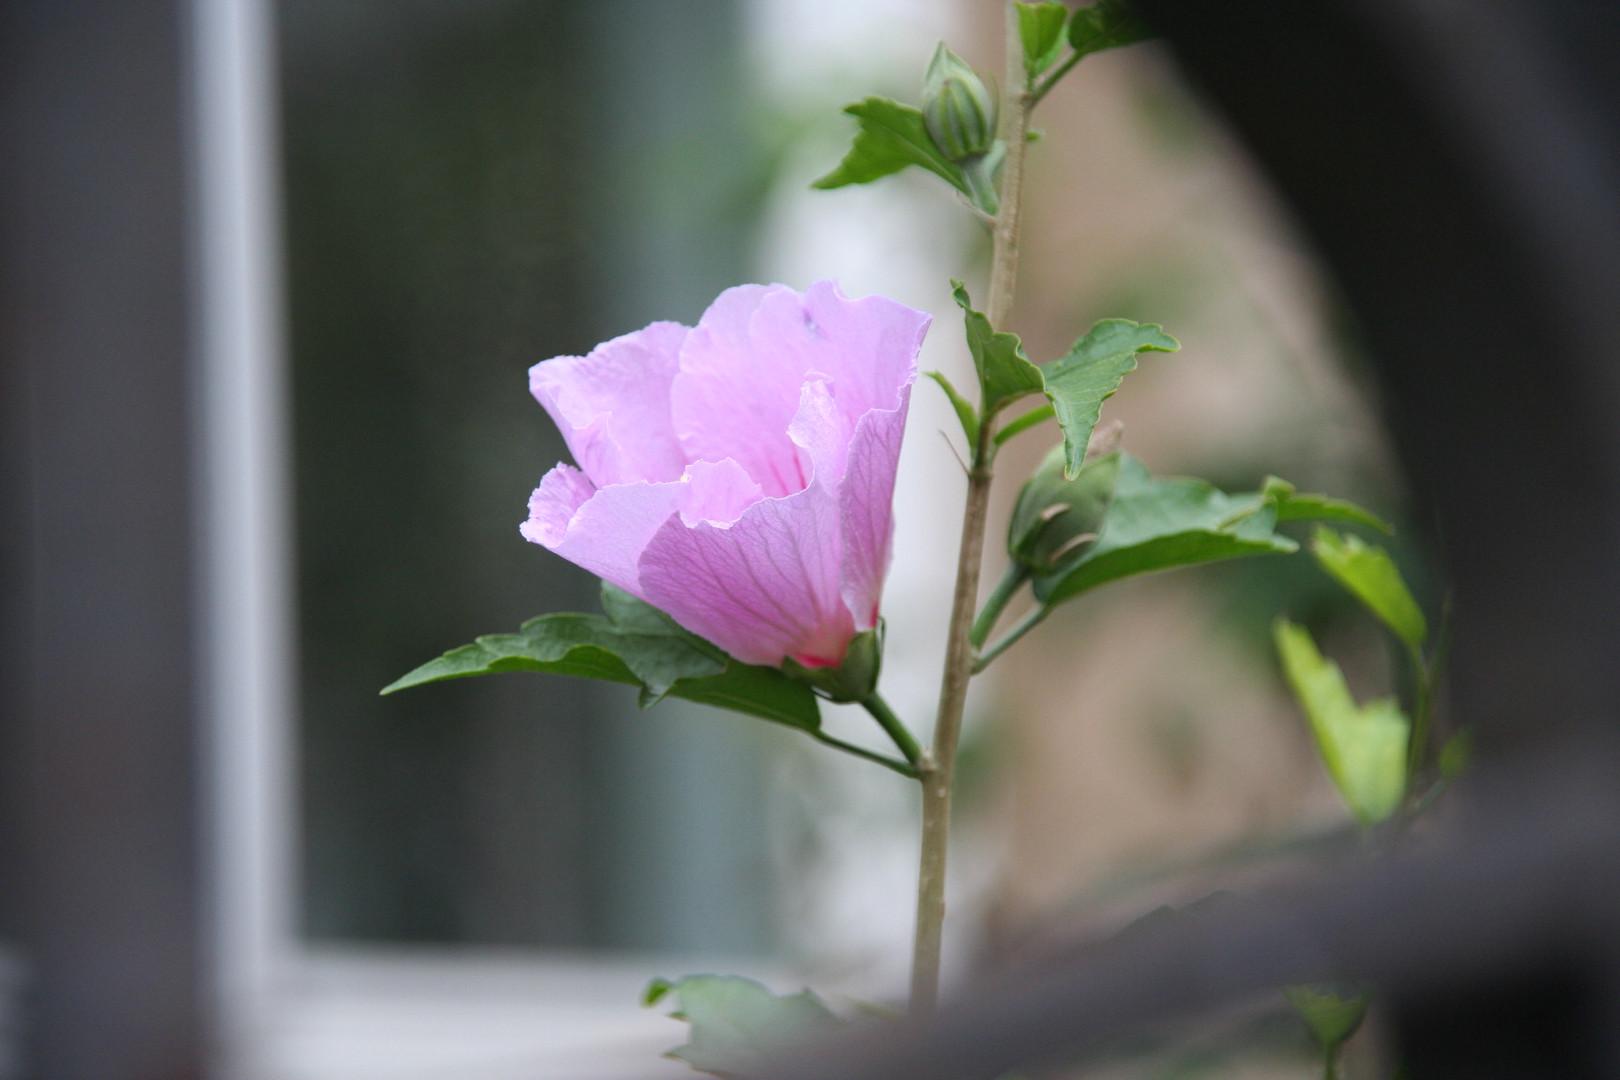 Blüt in Nachbars Garten